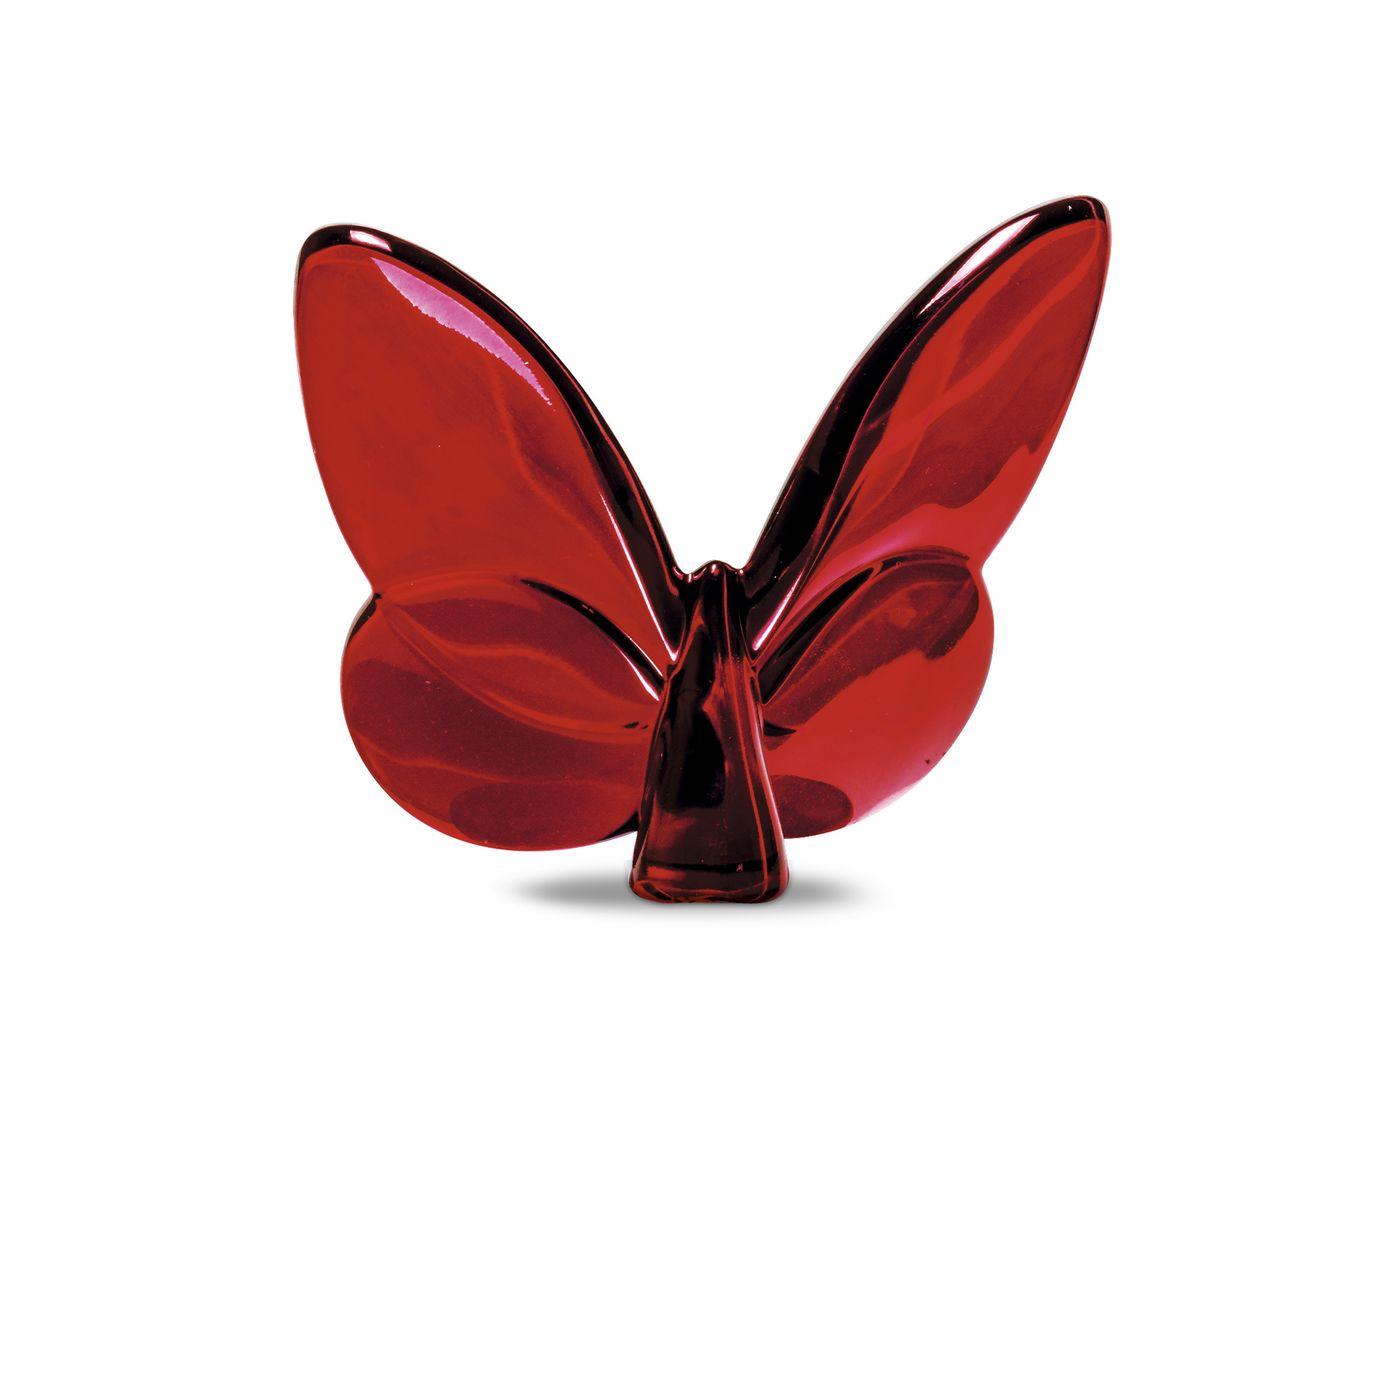 Farfalla baccarat argenteria dabbene milano liste for Miroir rouge